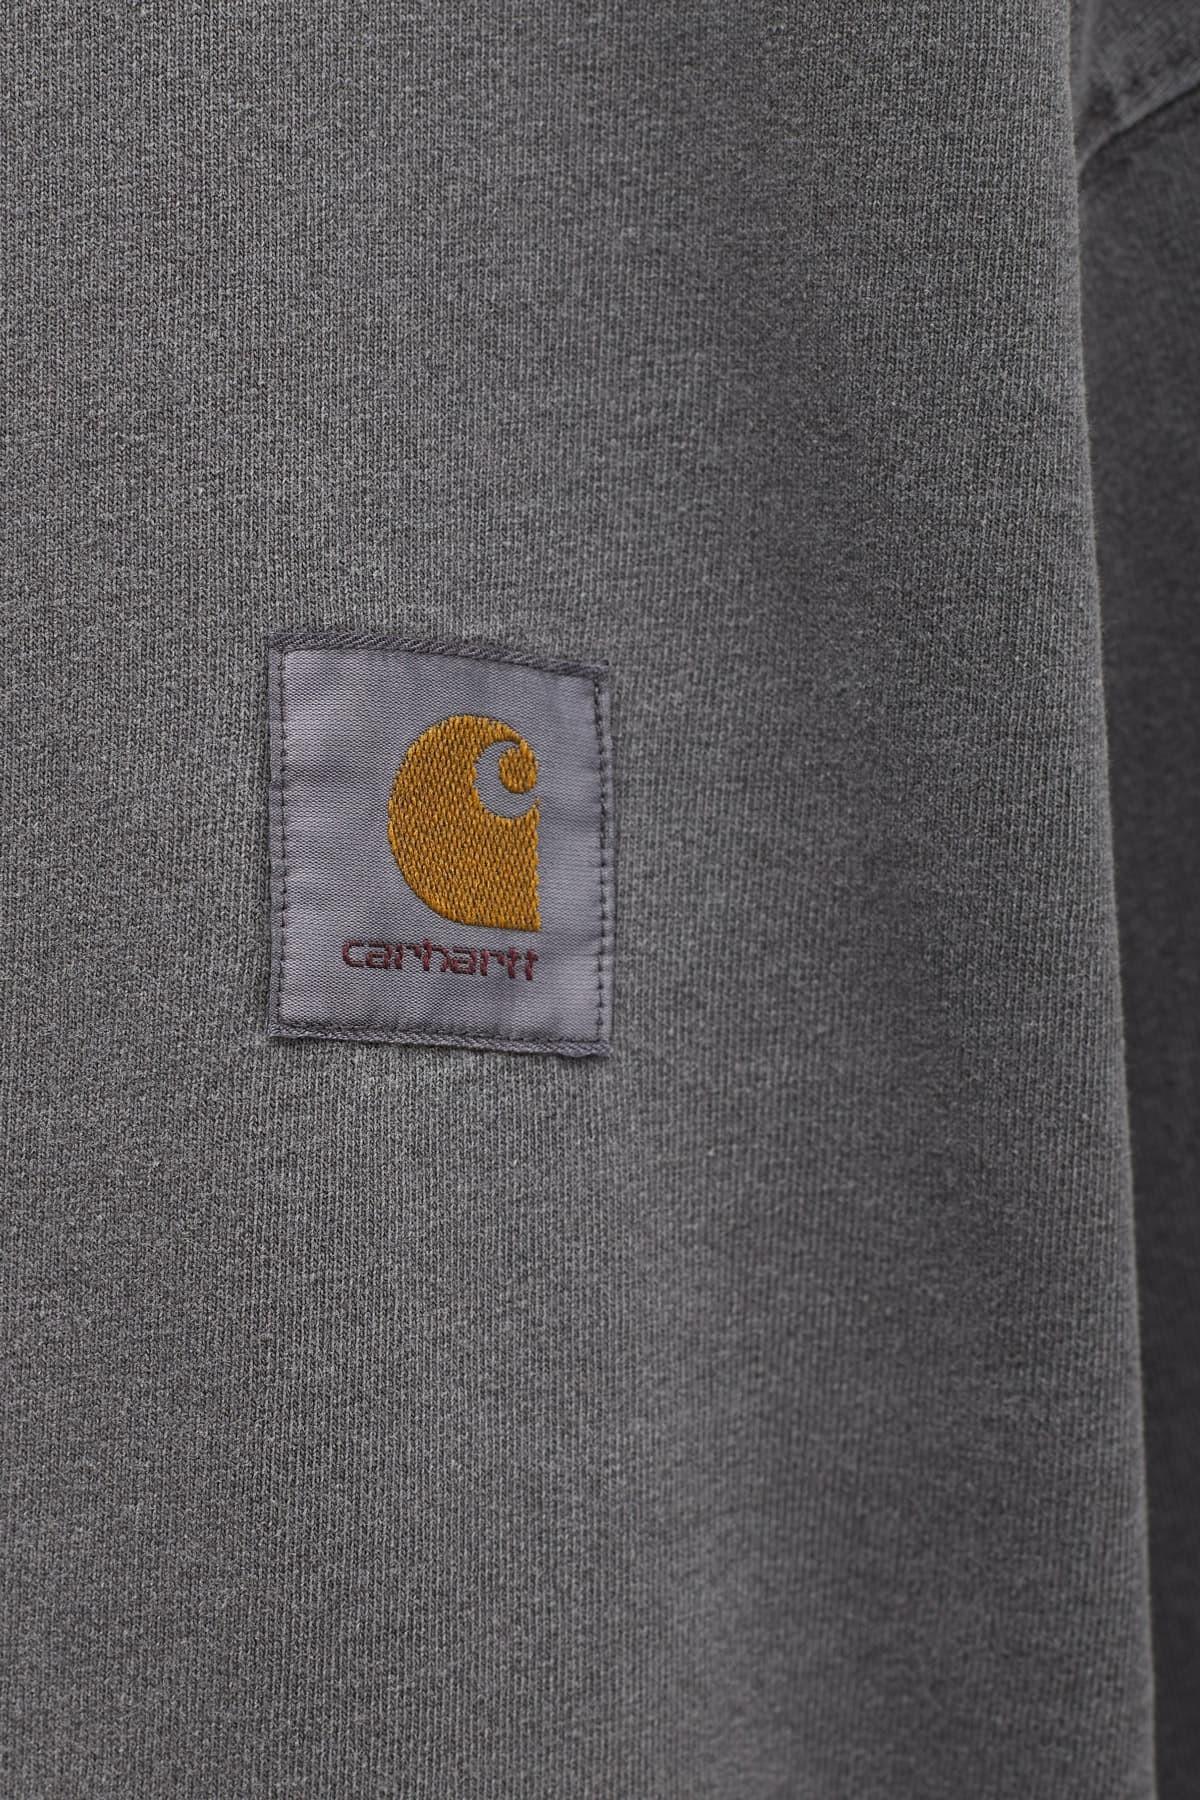 Comprar Carhartt Wip Black Rinsed Bib Overall Trouser